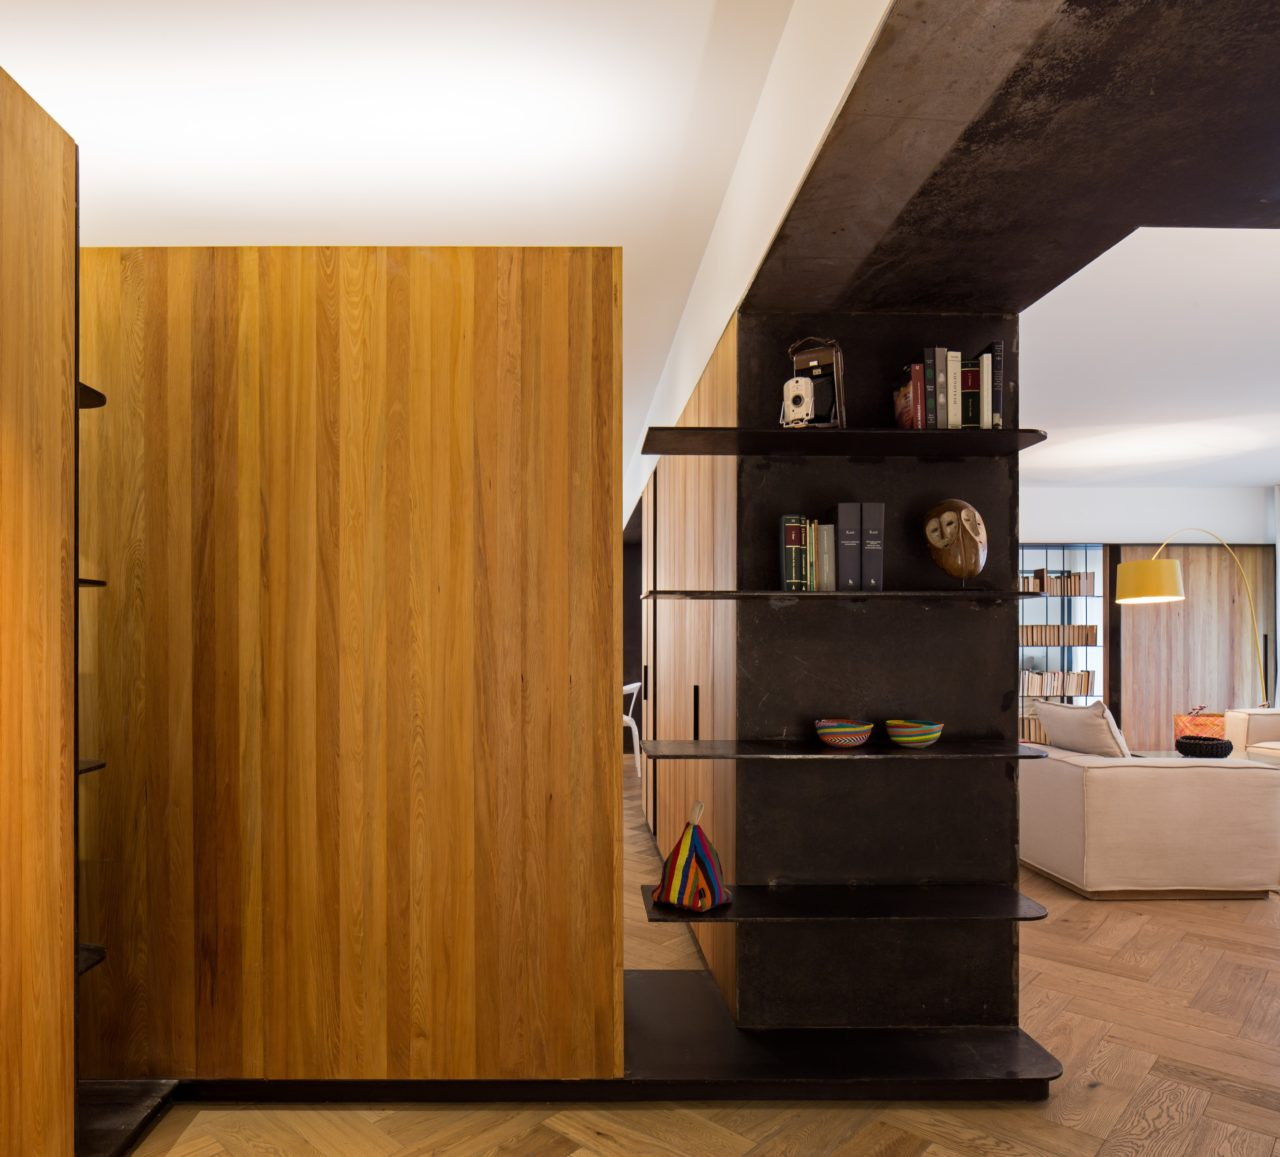 Apartment in Parque Forestal by Aguilo+Pedraza Arquitectos